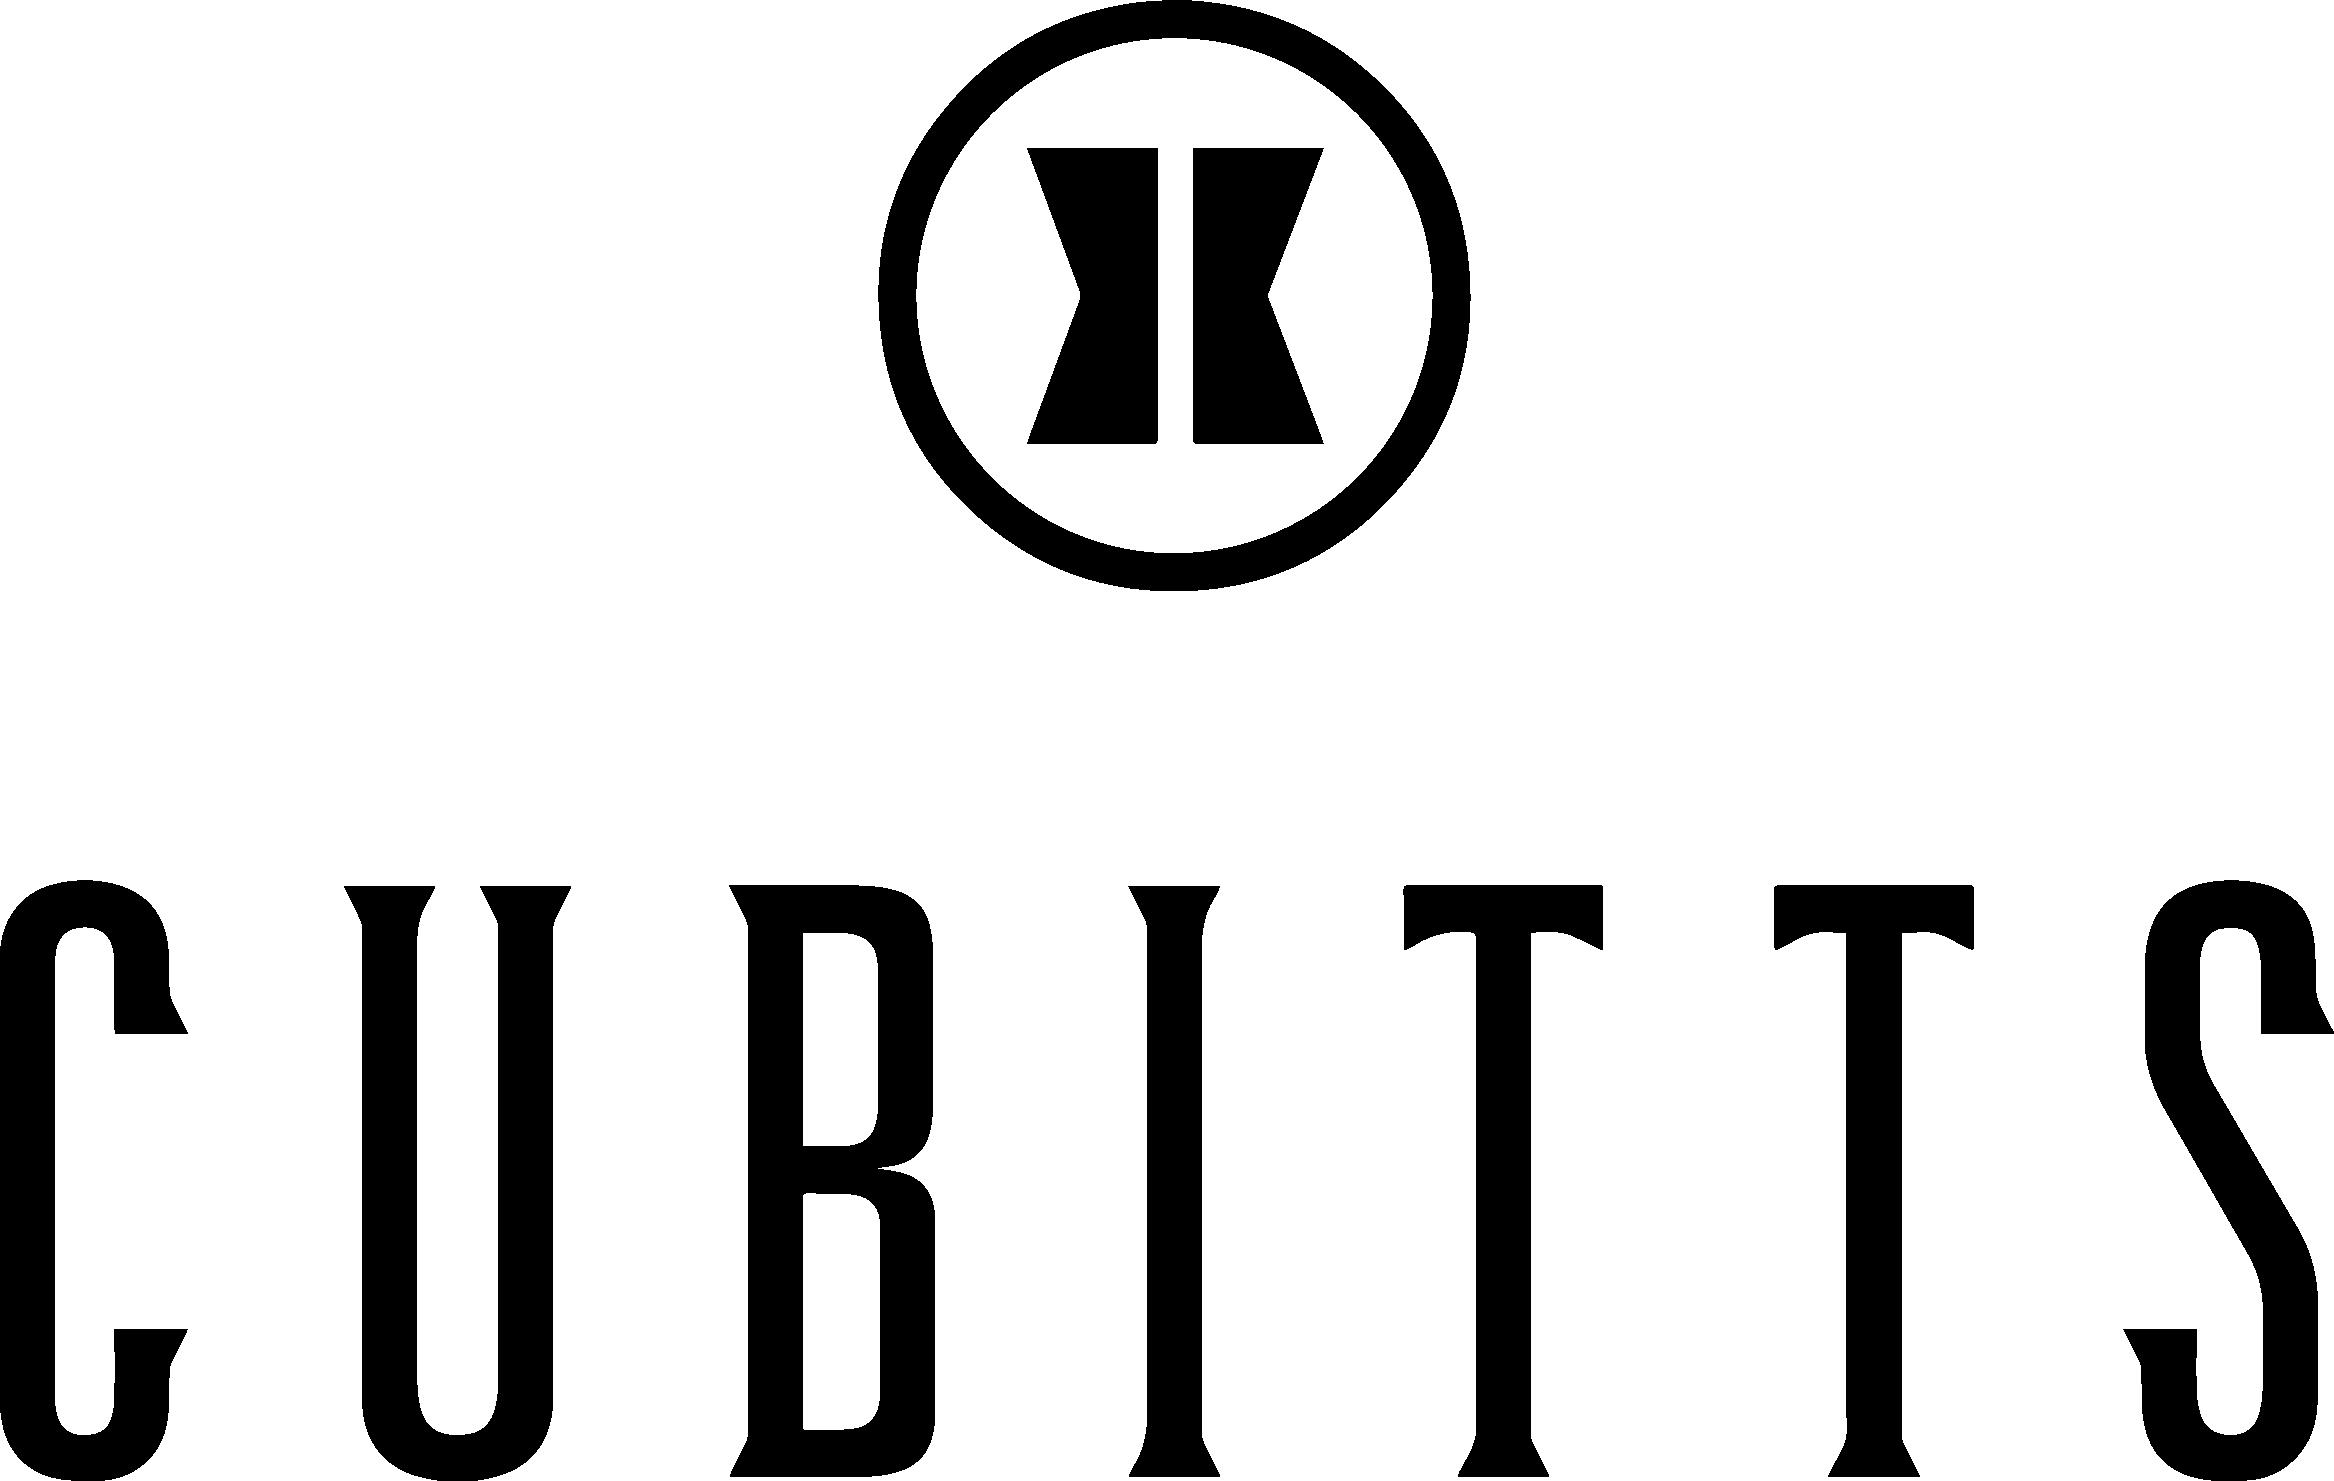 Cubitts logo 2.png